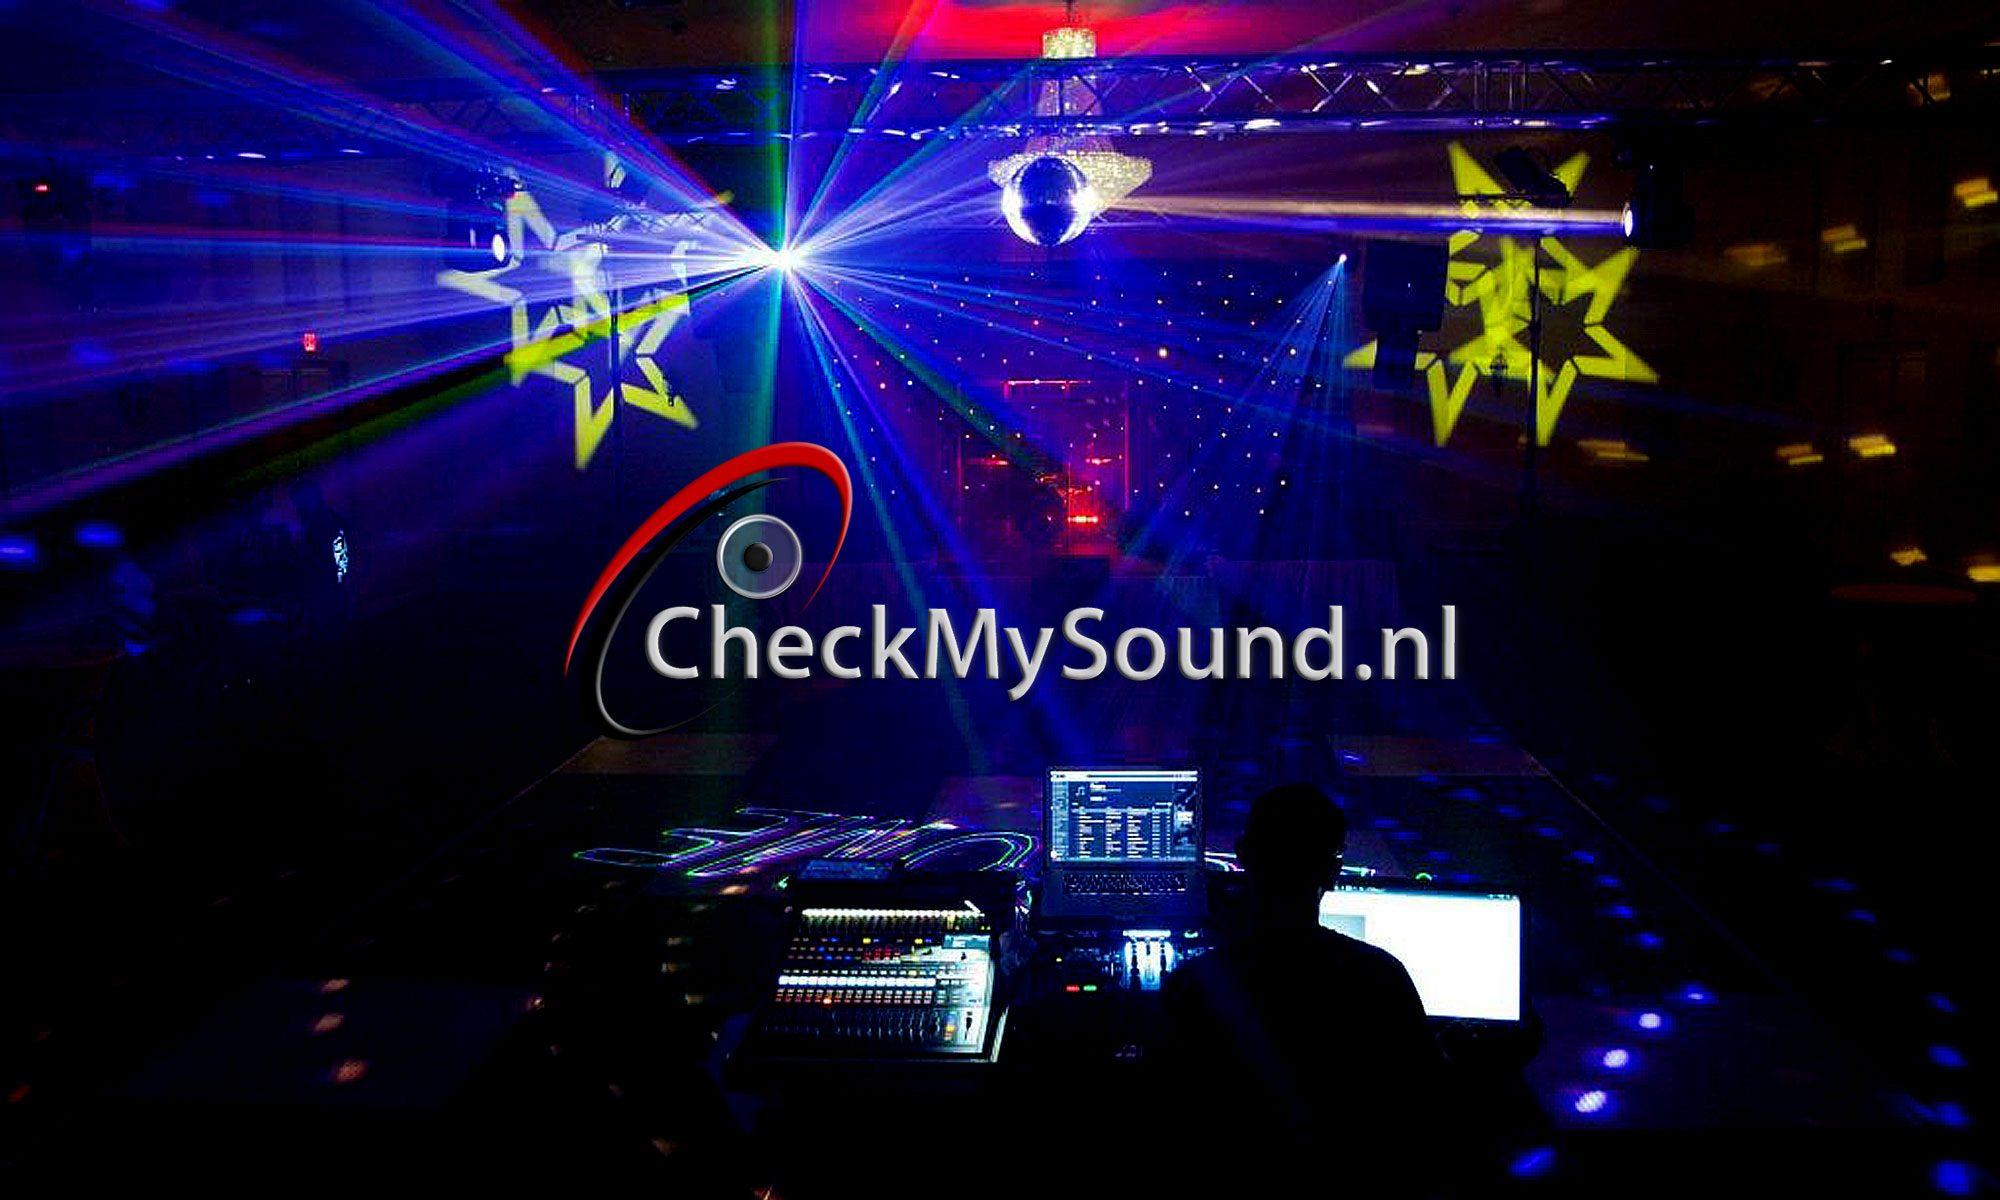 CheckMySound.nl